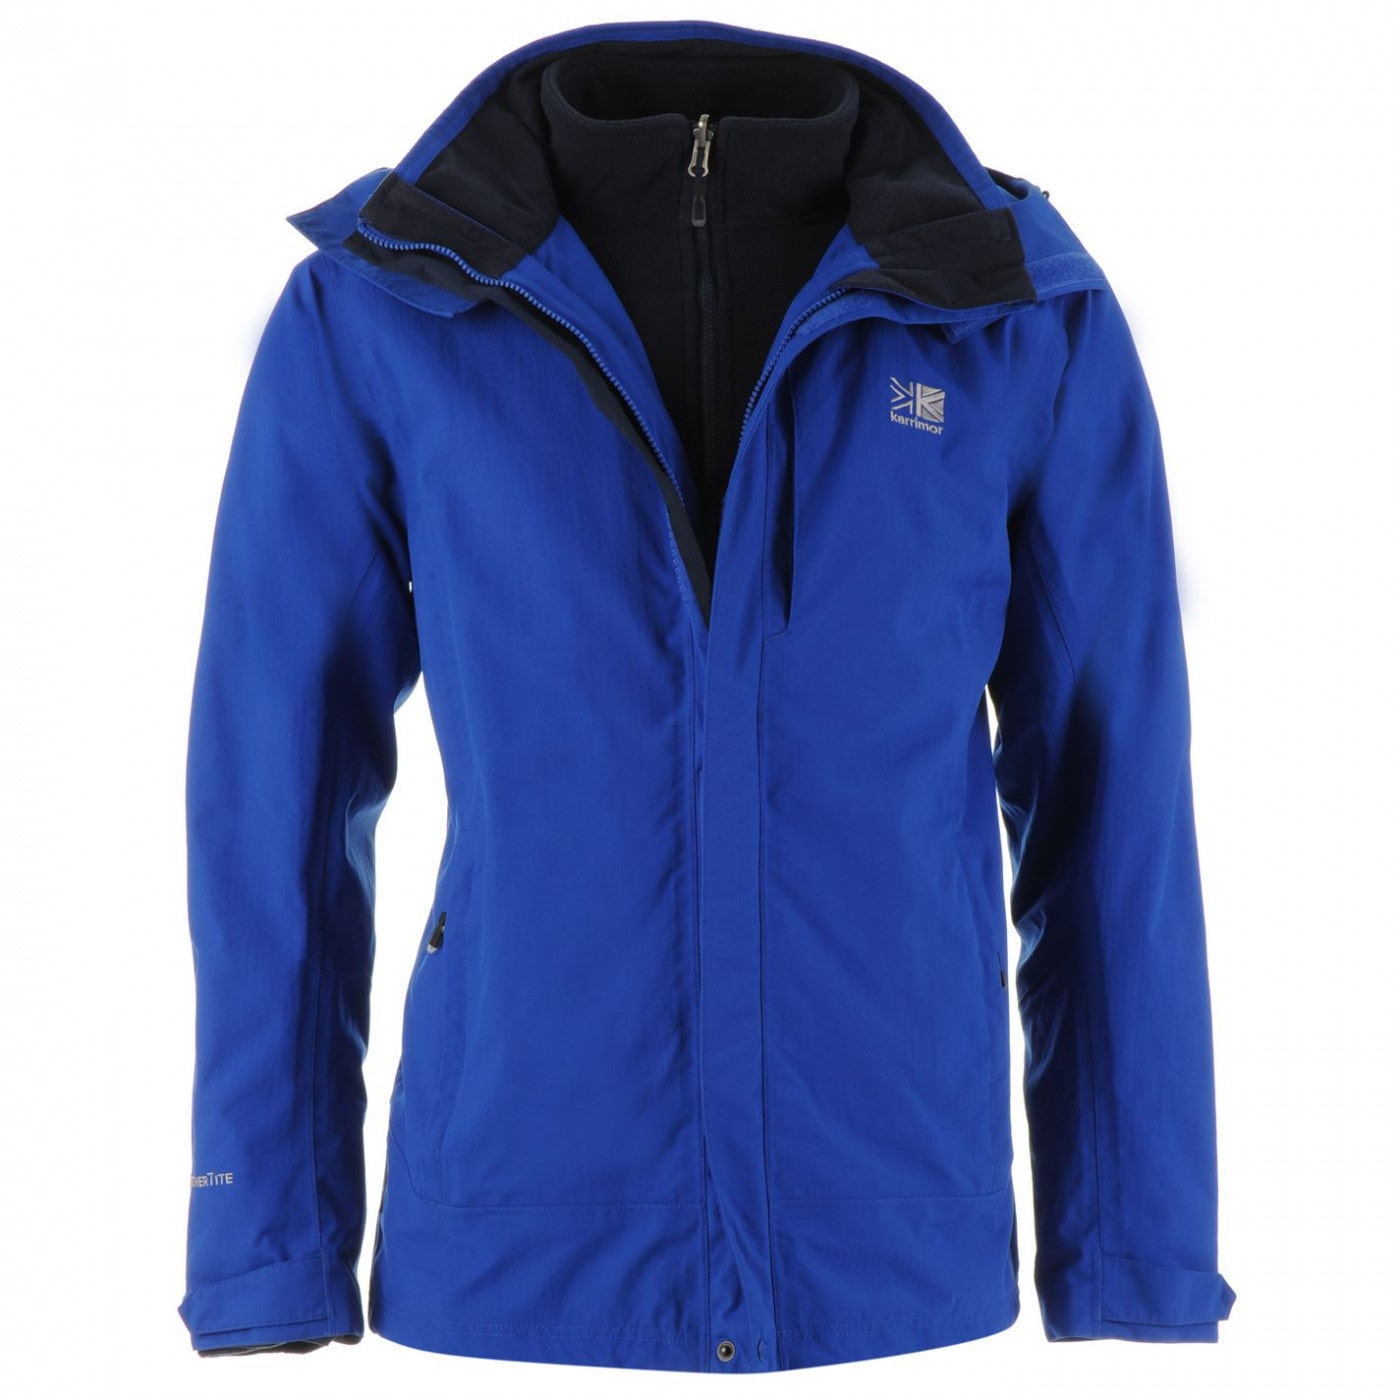 Men's softshell jacket Karrimor 3in1